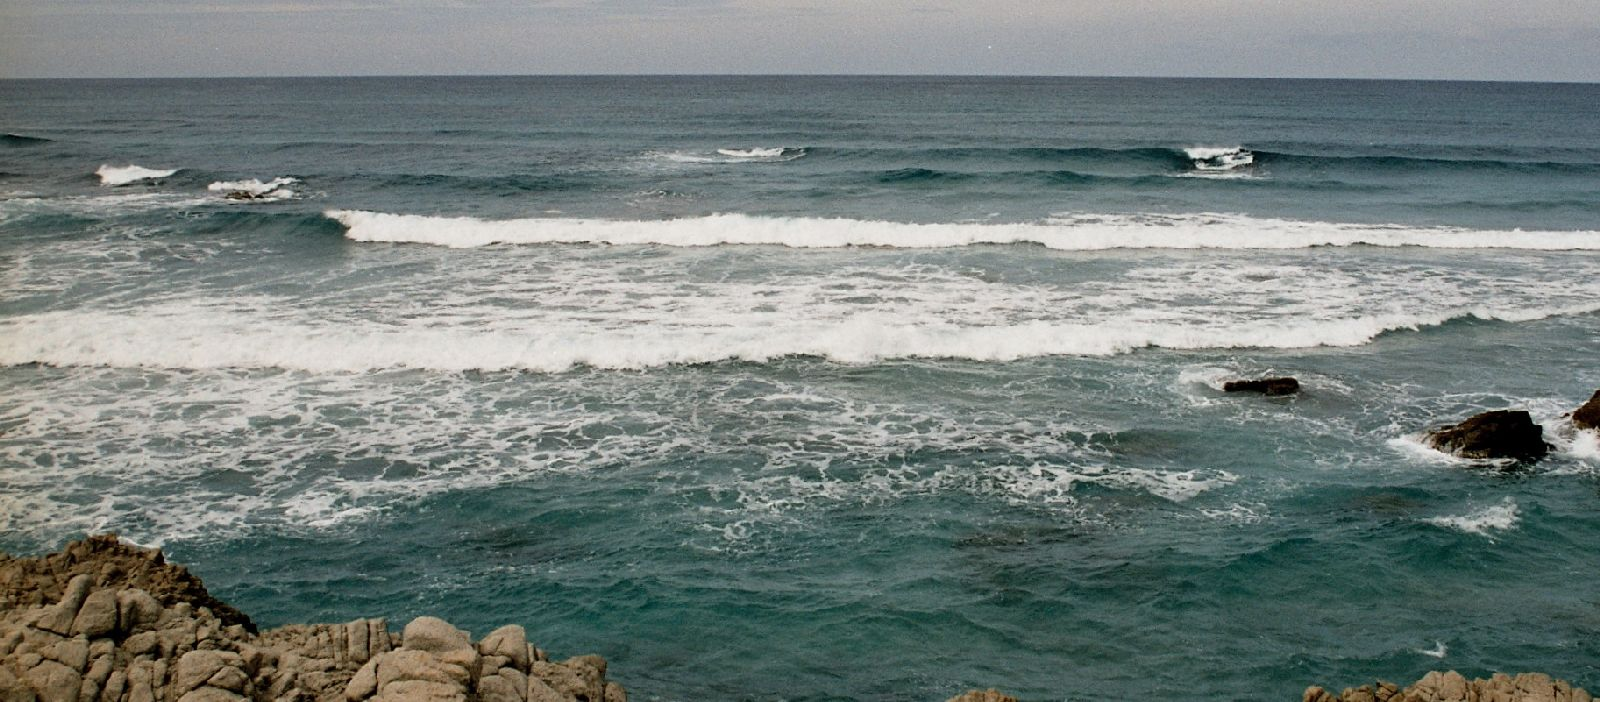 Windsurfen_Chia_Capo_Mannu_01.jpg